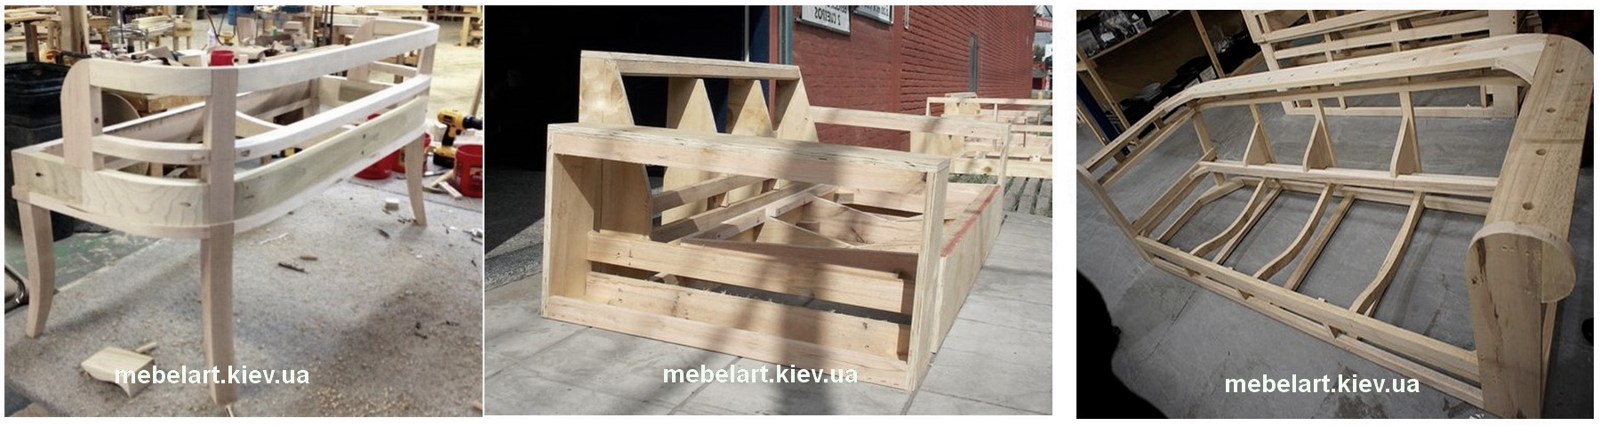 деревянный каркас для дивана